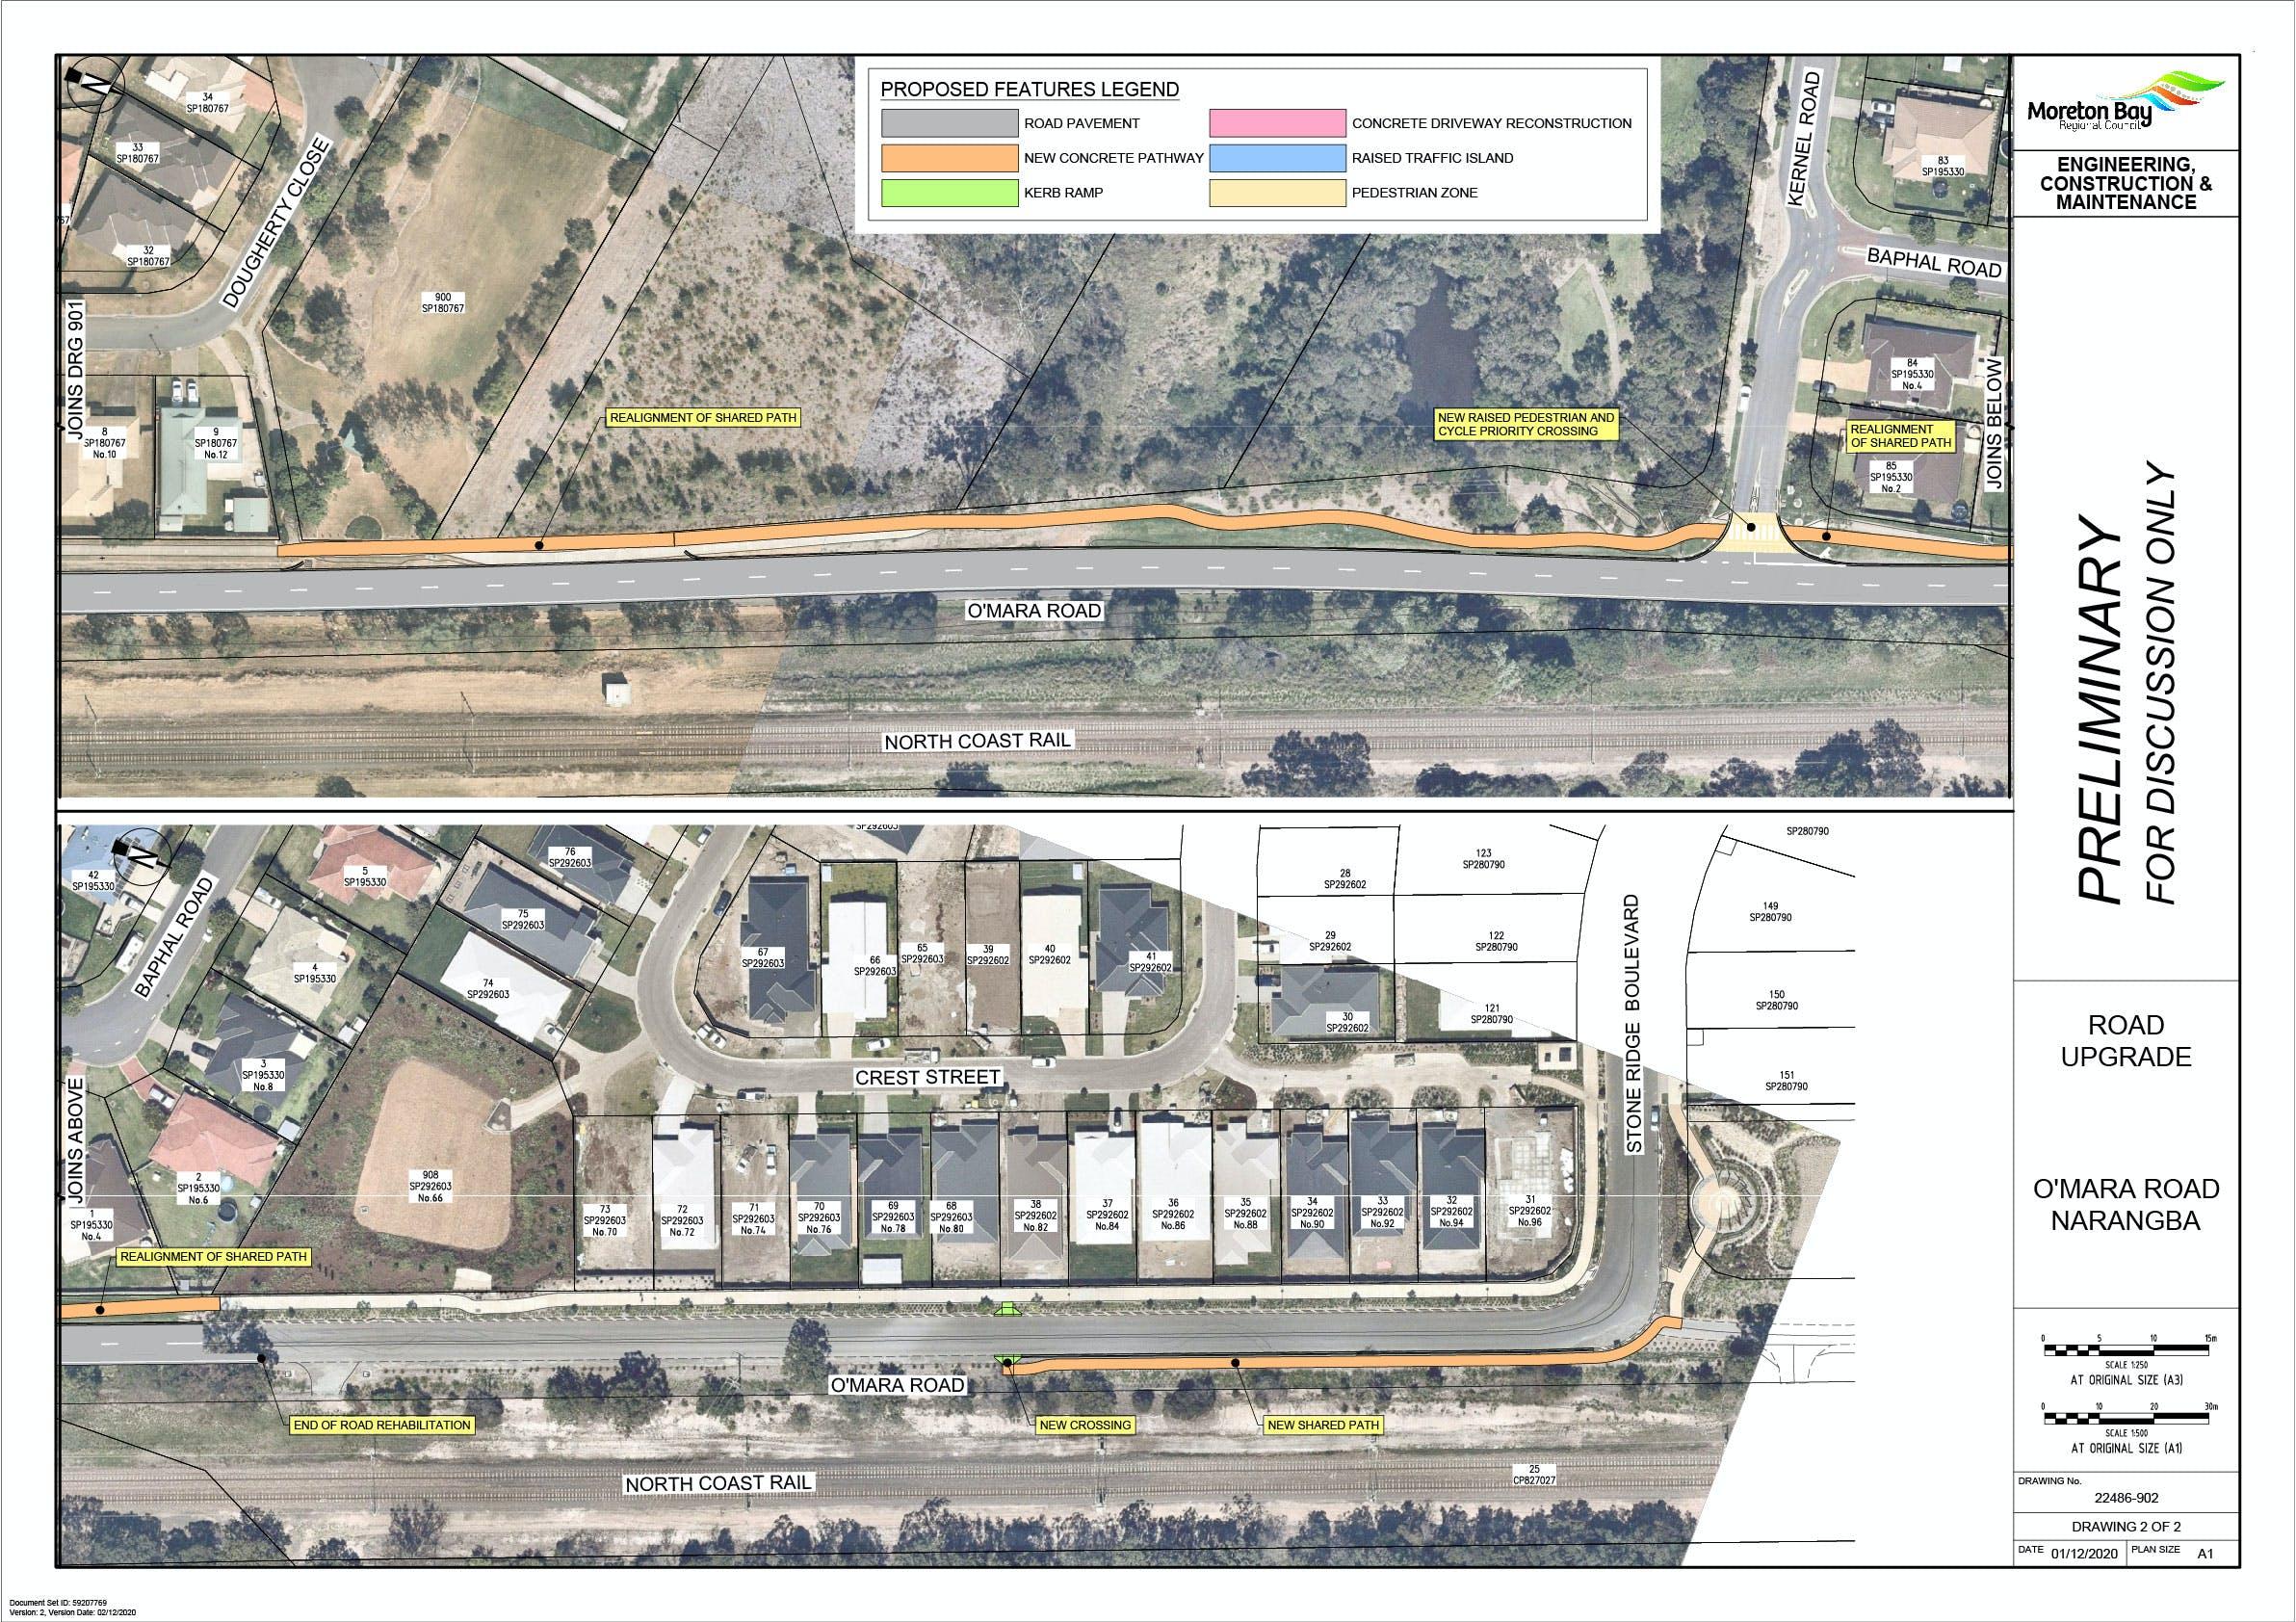 O'Mara Road Concept Design (2)